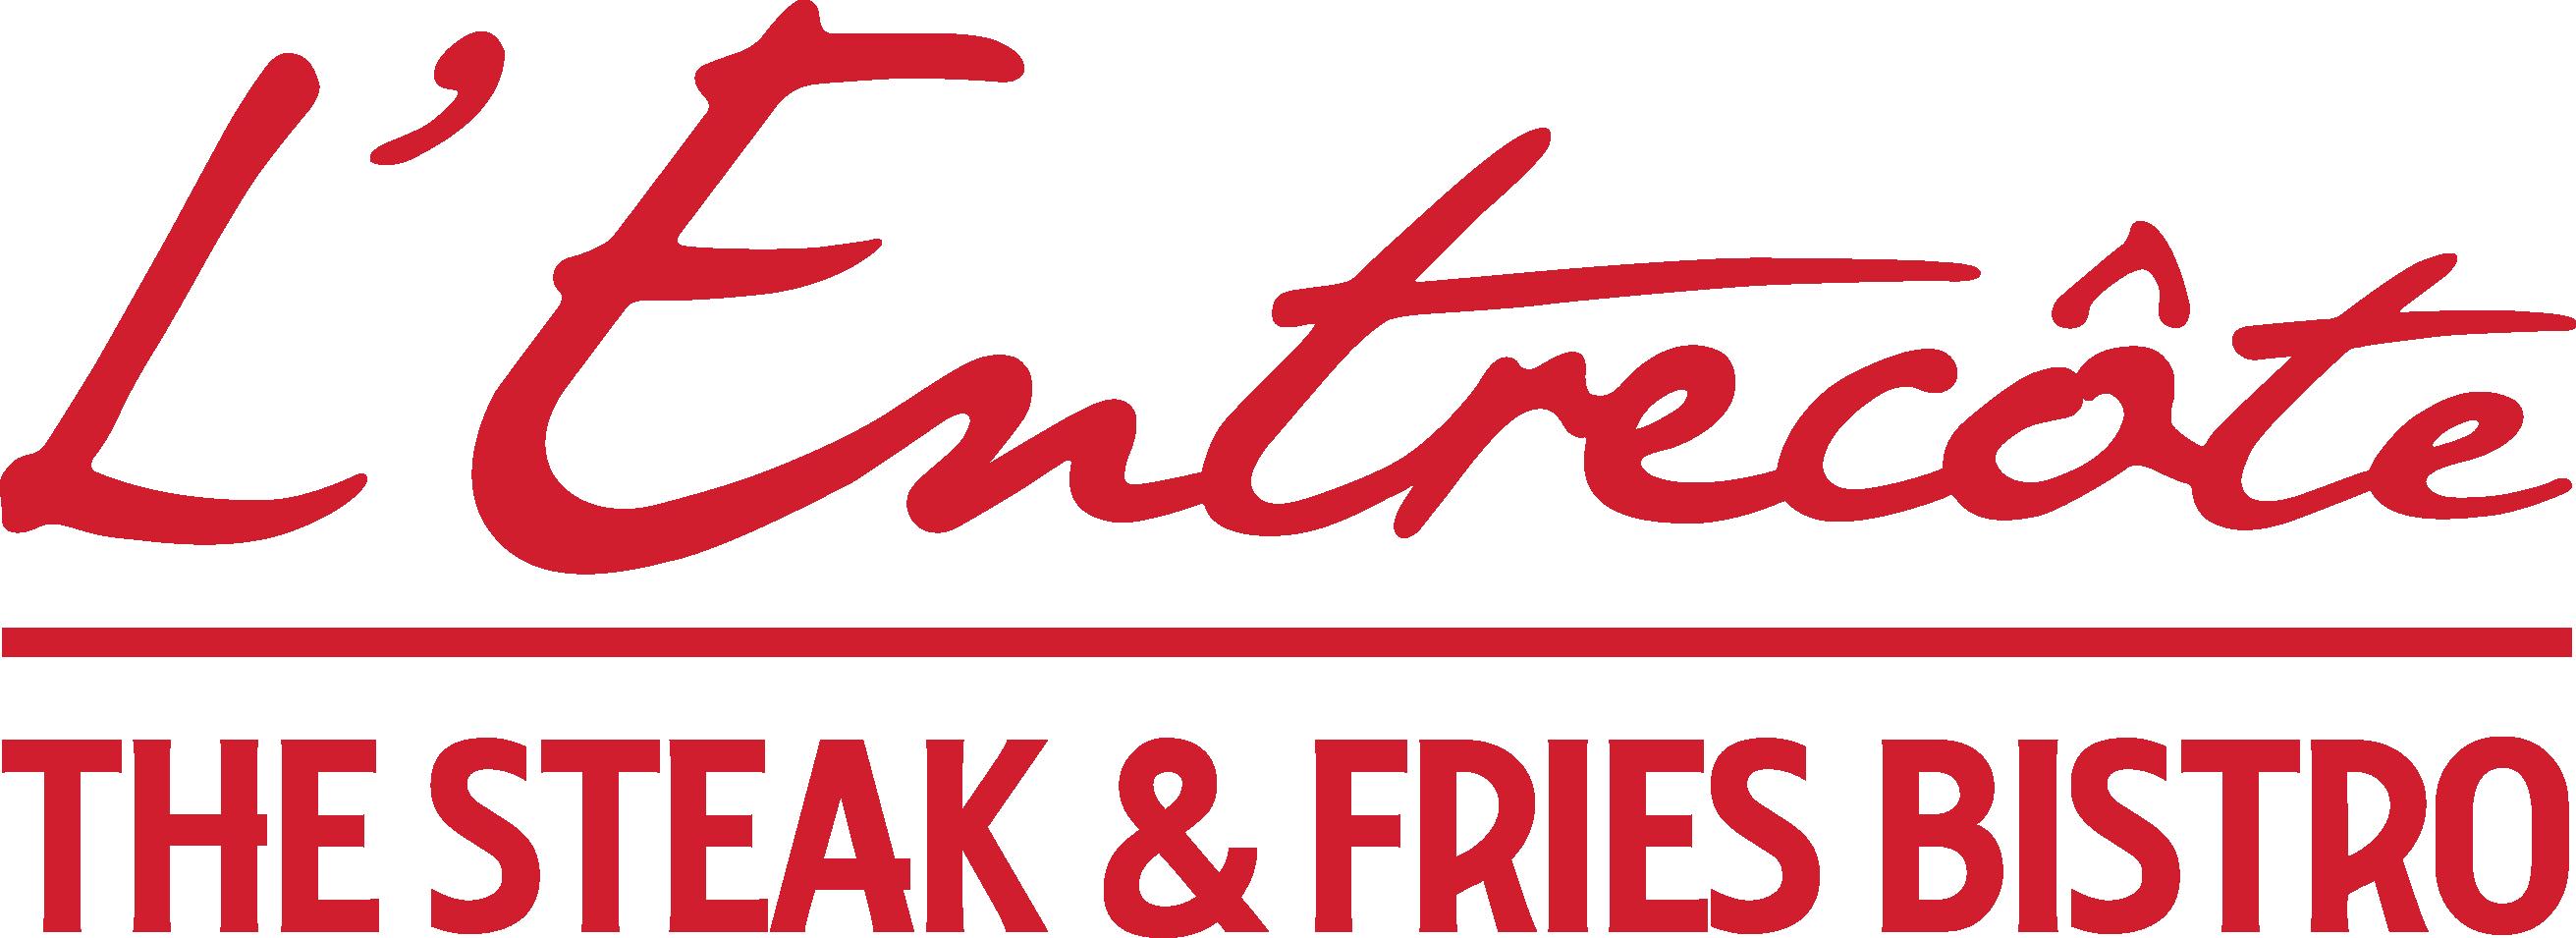 Lentrecote Steak Fries Logo